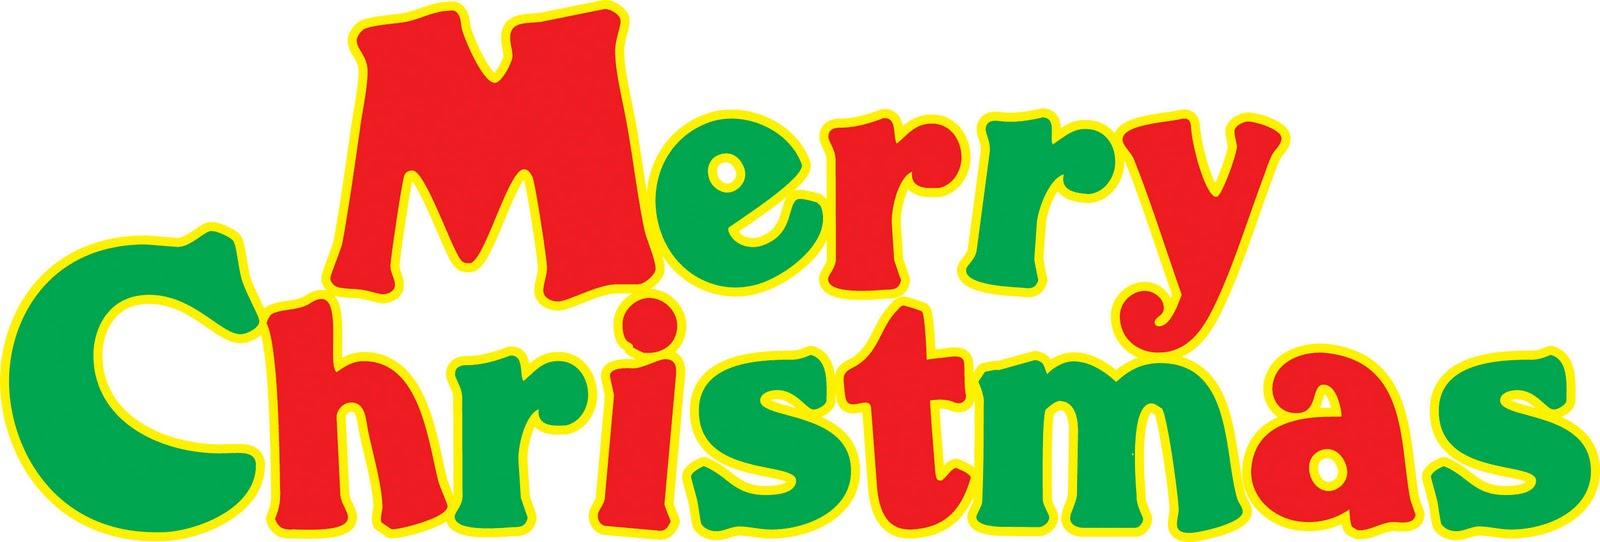 Christmas Clip Art Merry .-Christmas Clip Art Merry .-1